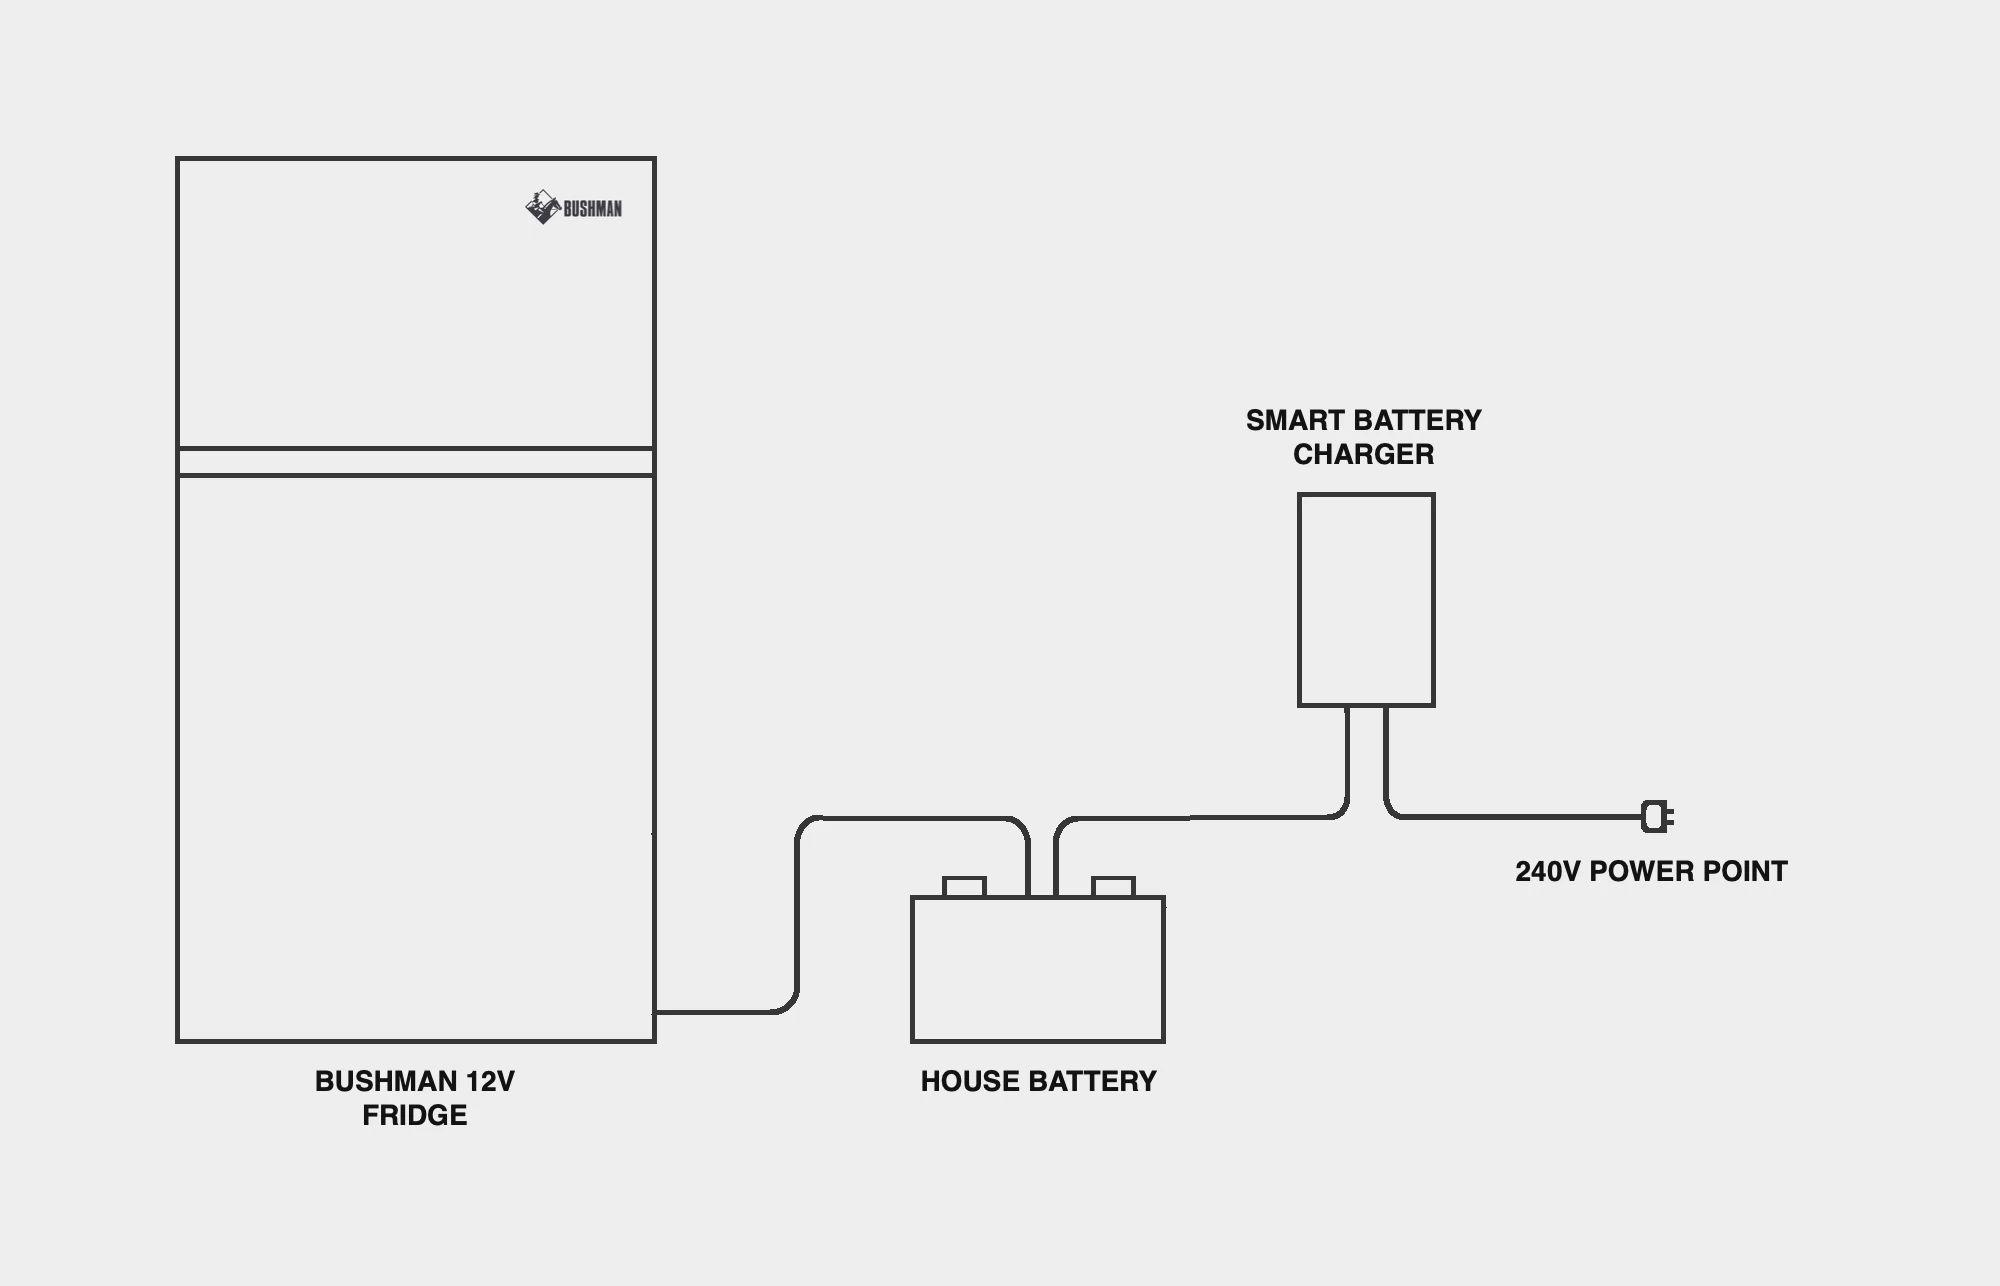 3 way caravan fridge wiring diagram